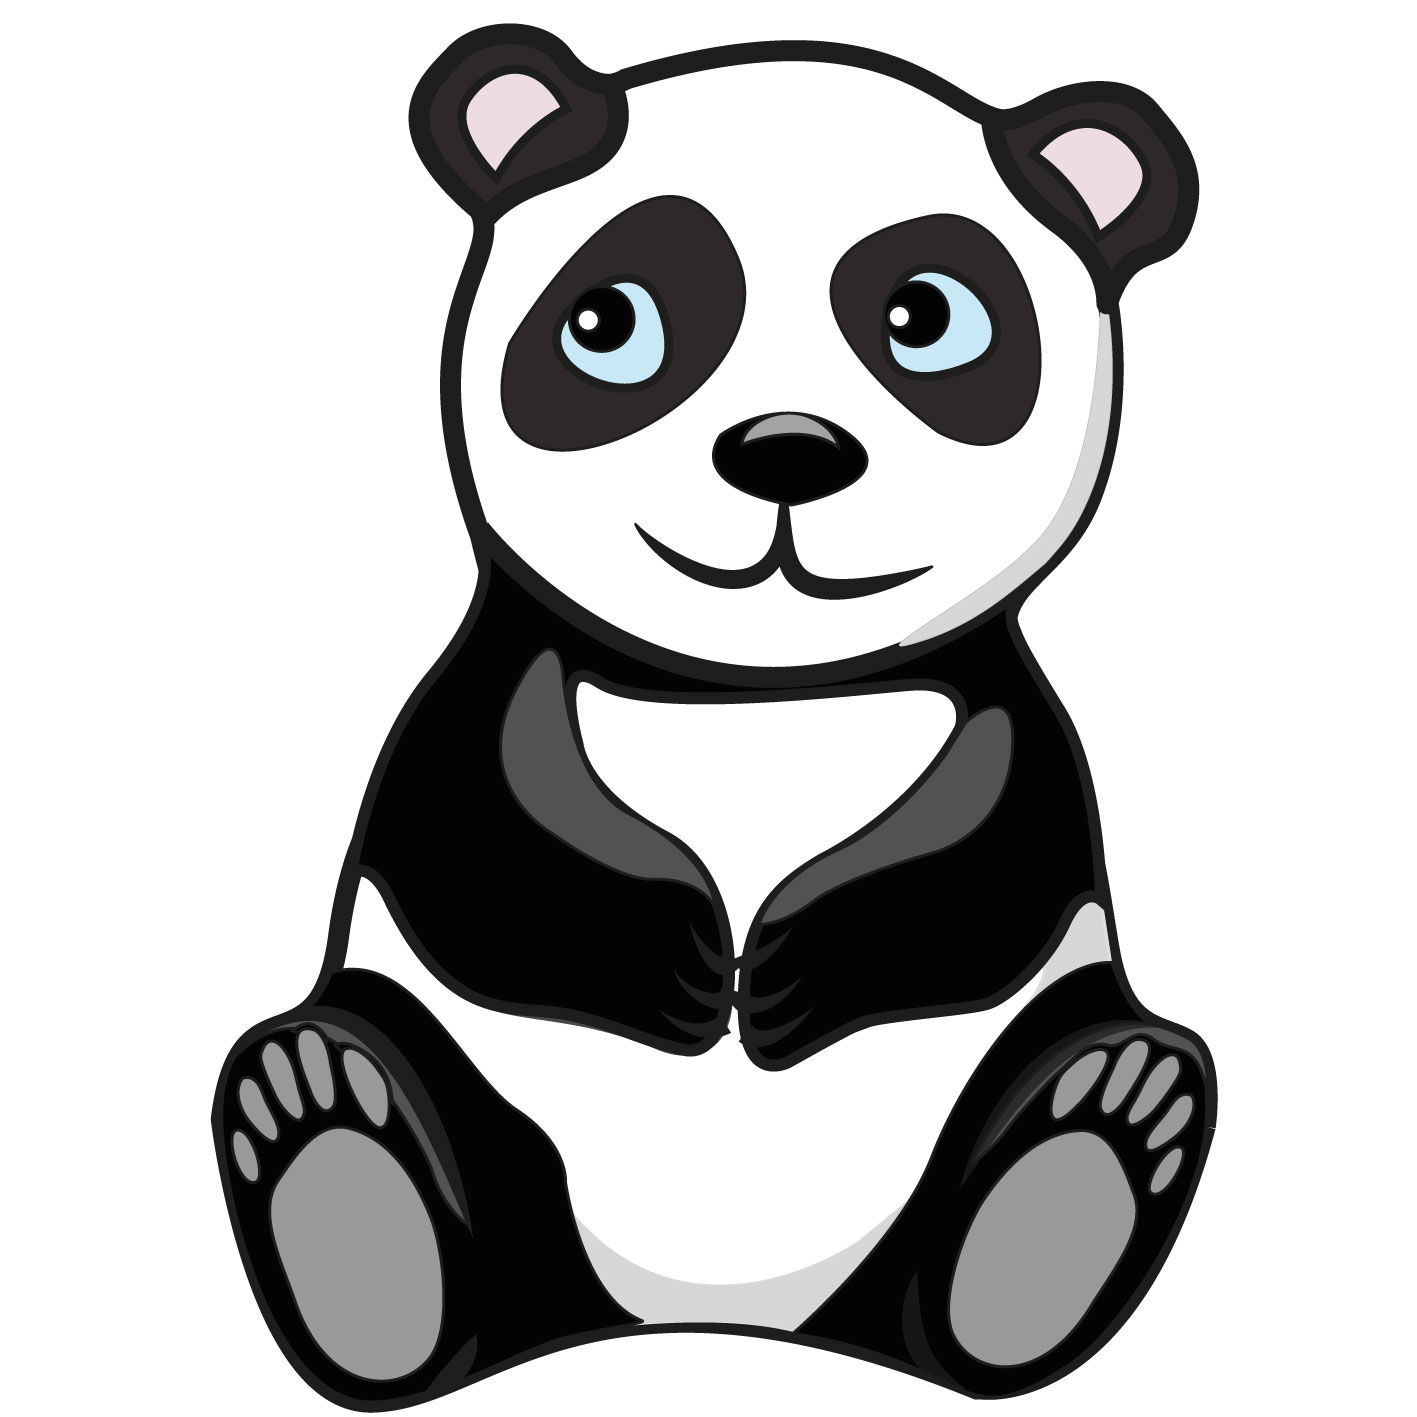 Dessins en couleurs imprimer panda num ro 286388 - Dessins de panda ...